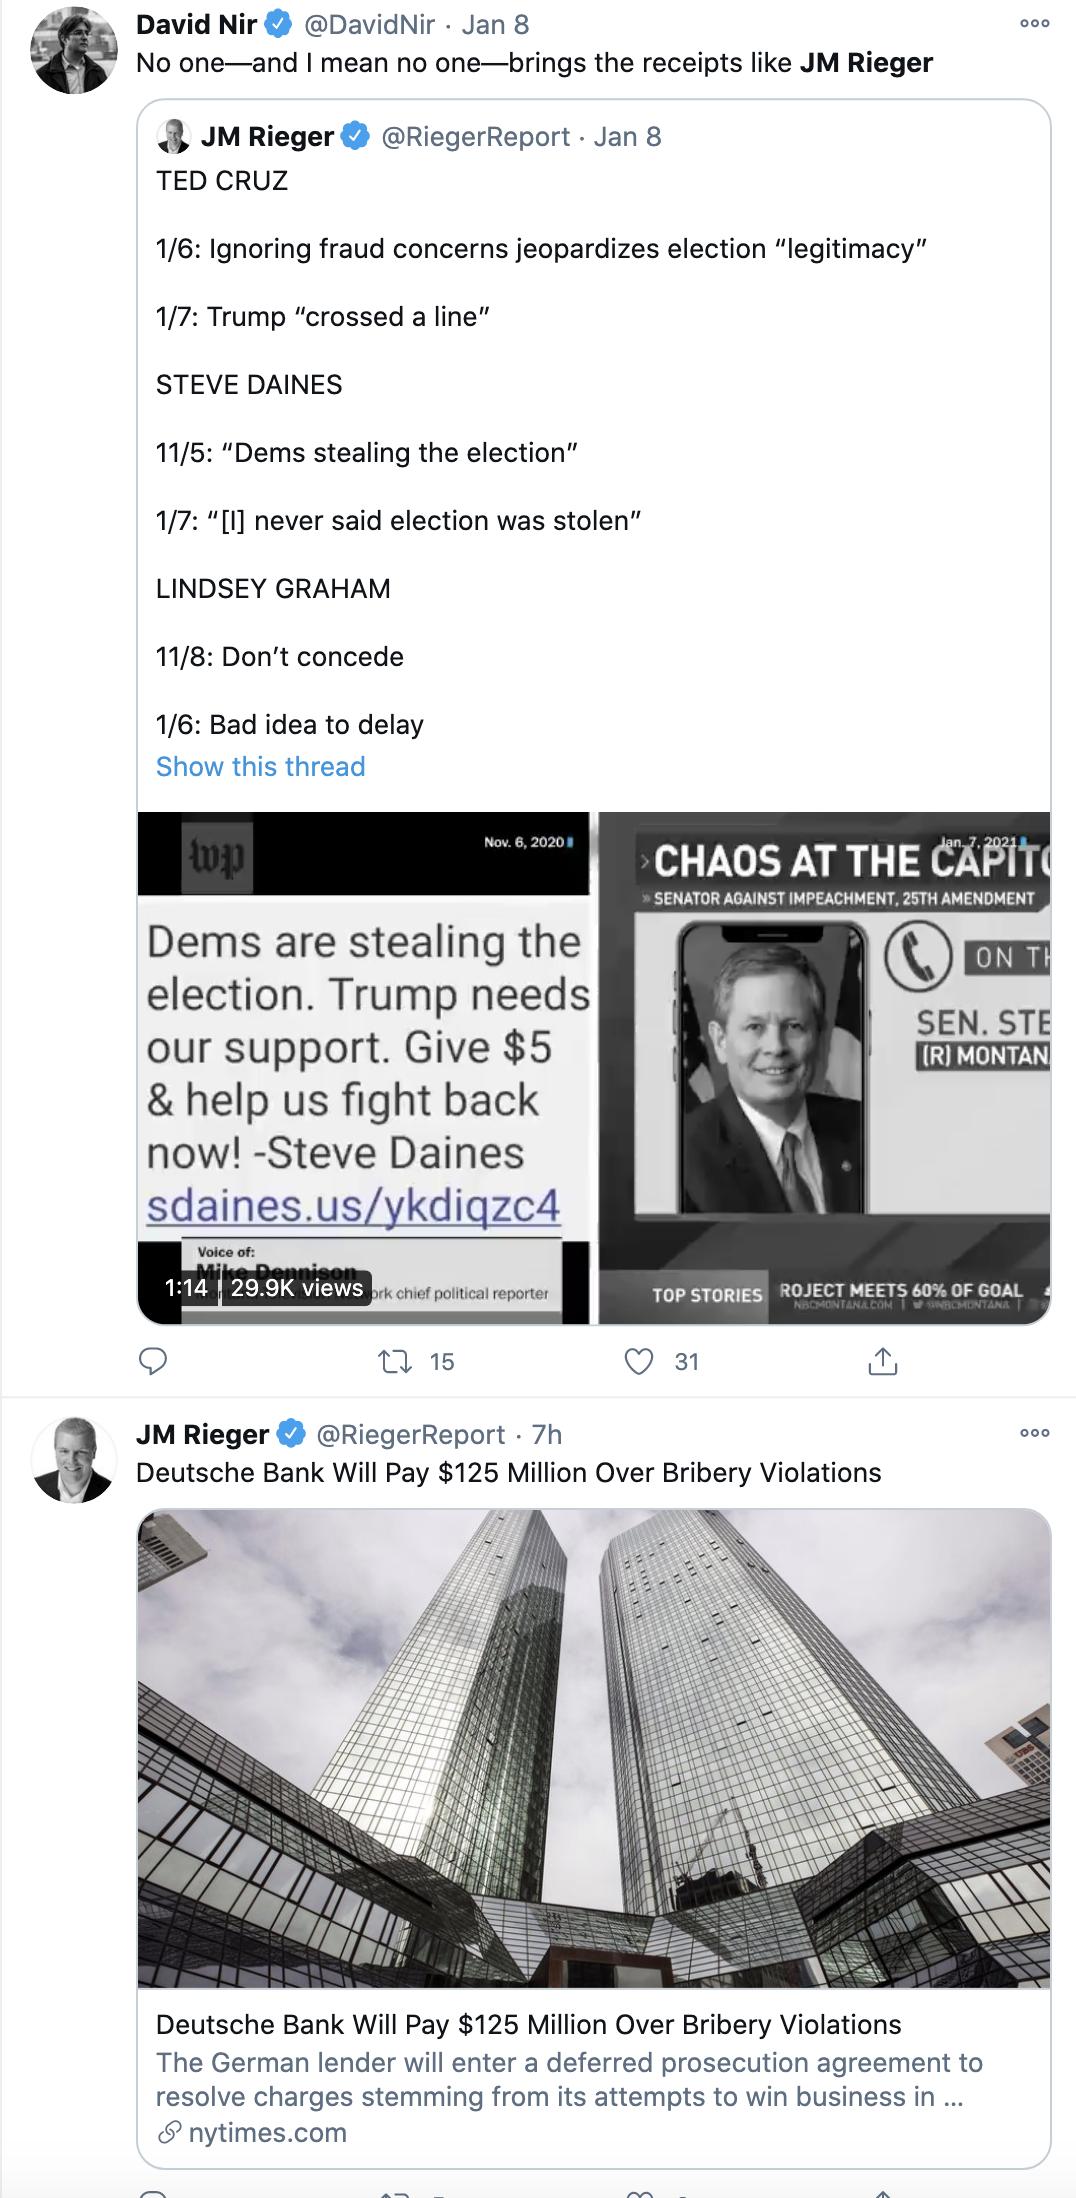 Screen-Shot-2021-01-10-at-2.37.08-PM Colin Powell Shames Trump & GOP Over MAGA Insurrection Crime Donald Trump Featured Politics Top Stories